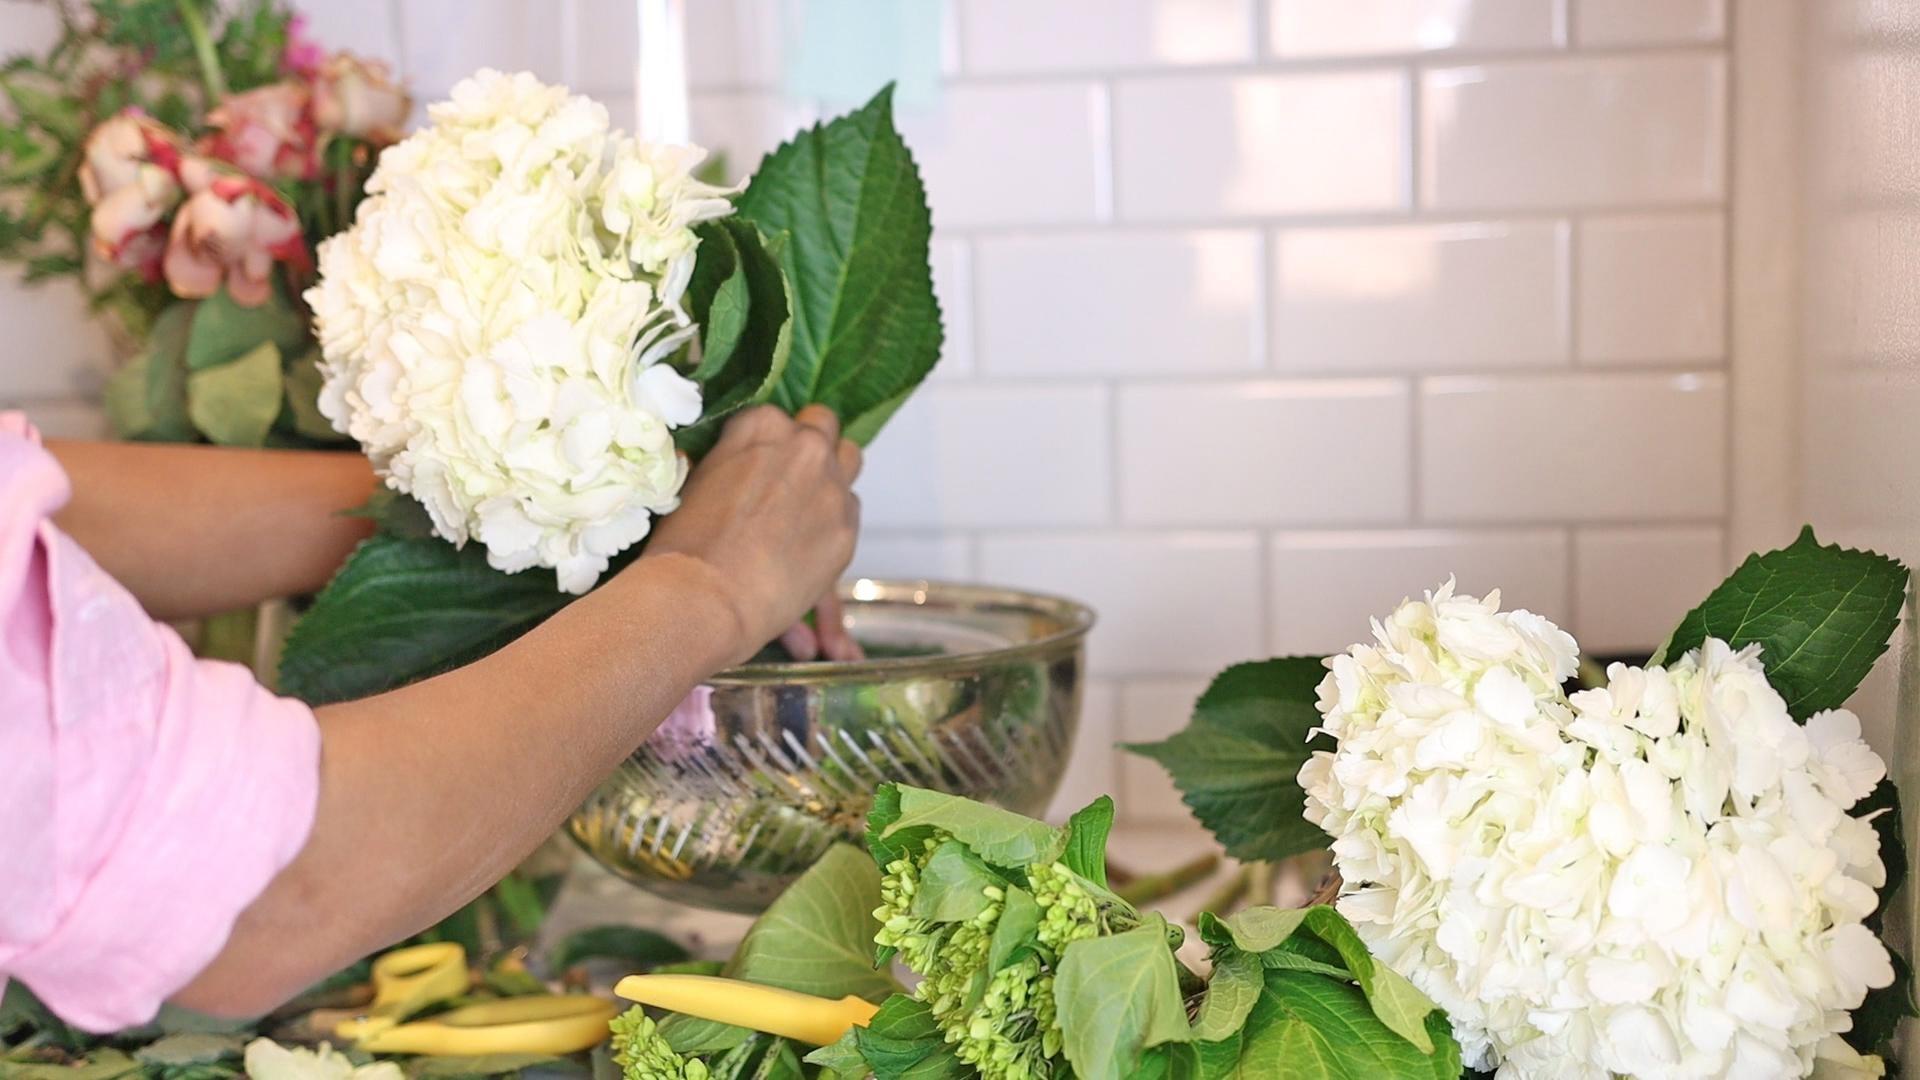 Amitha starts her bowl flower arrangement by placing large white hydrangeas